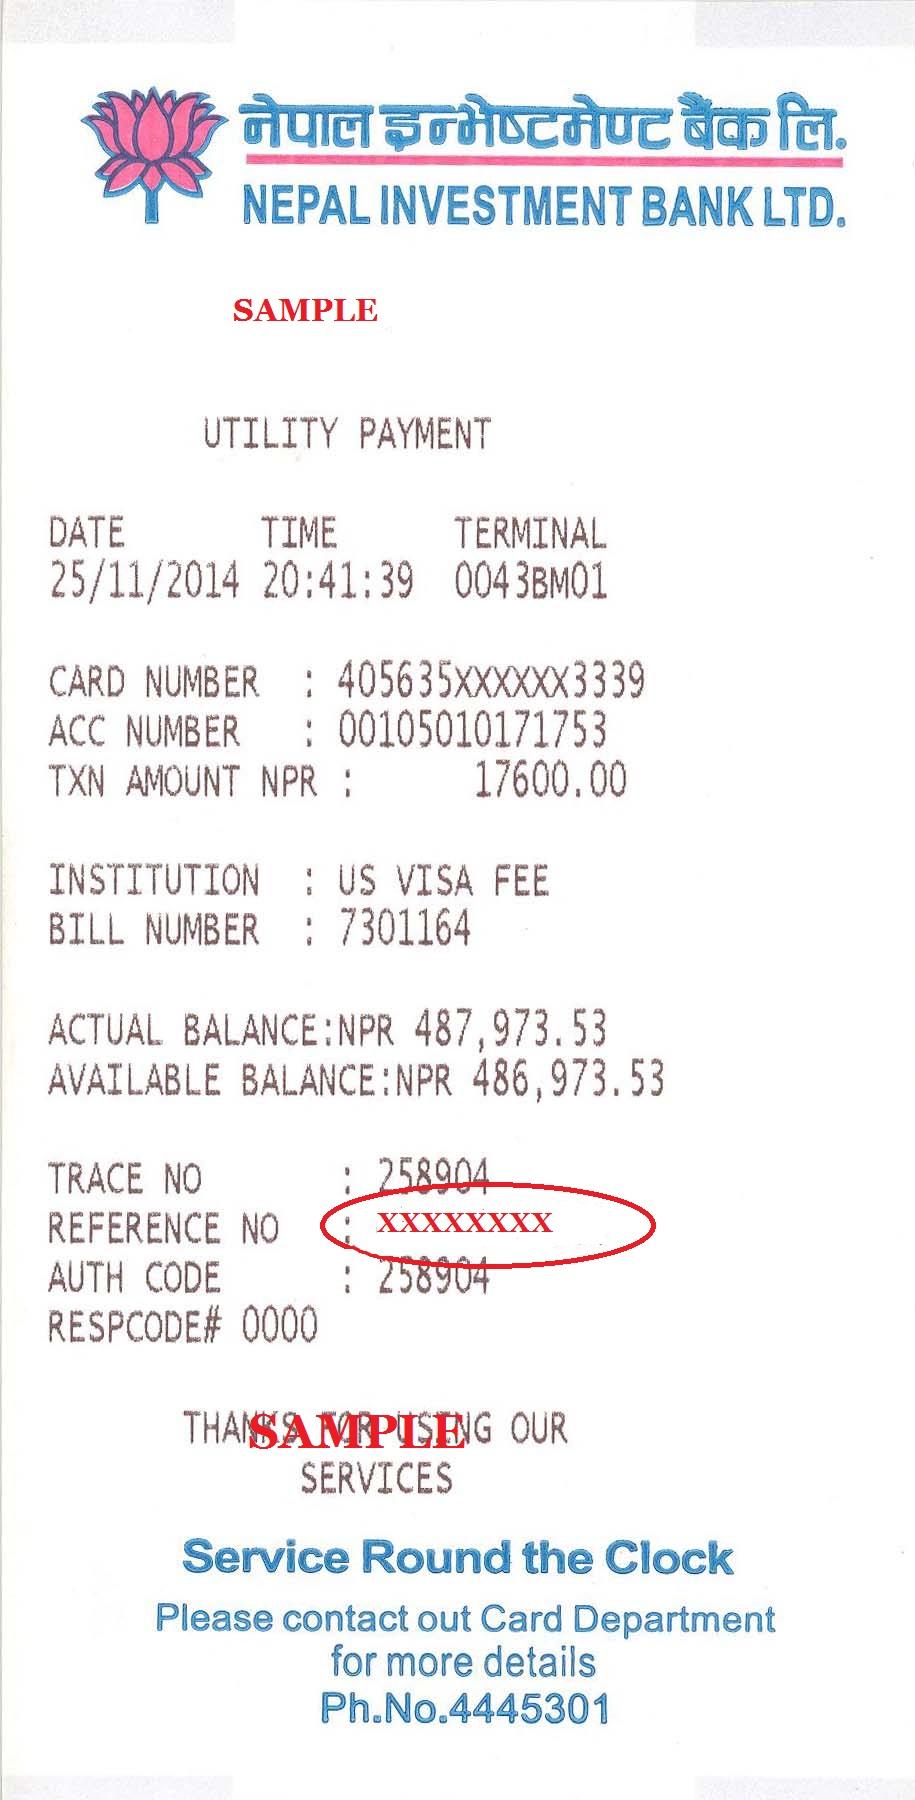 Ustraveldocs Ht Create Account - Cash at nibl bank